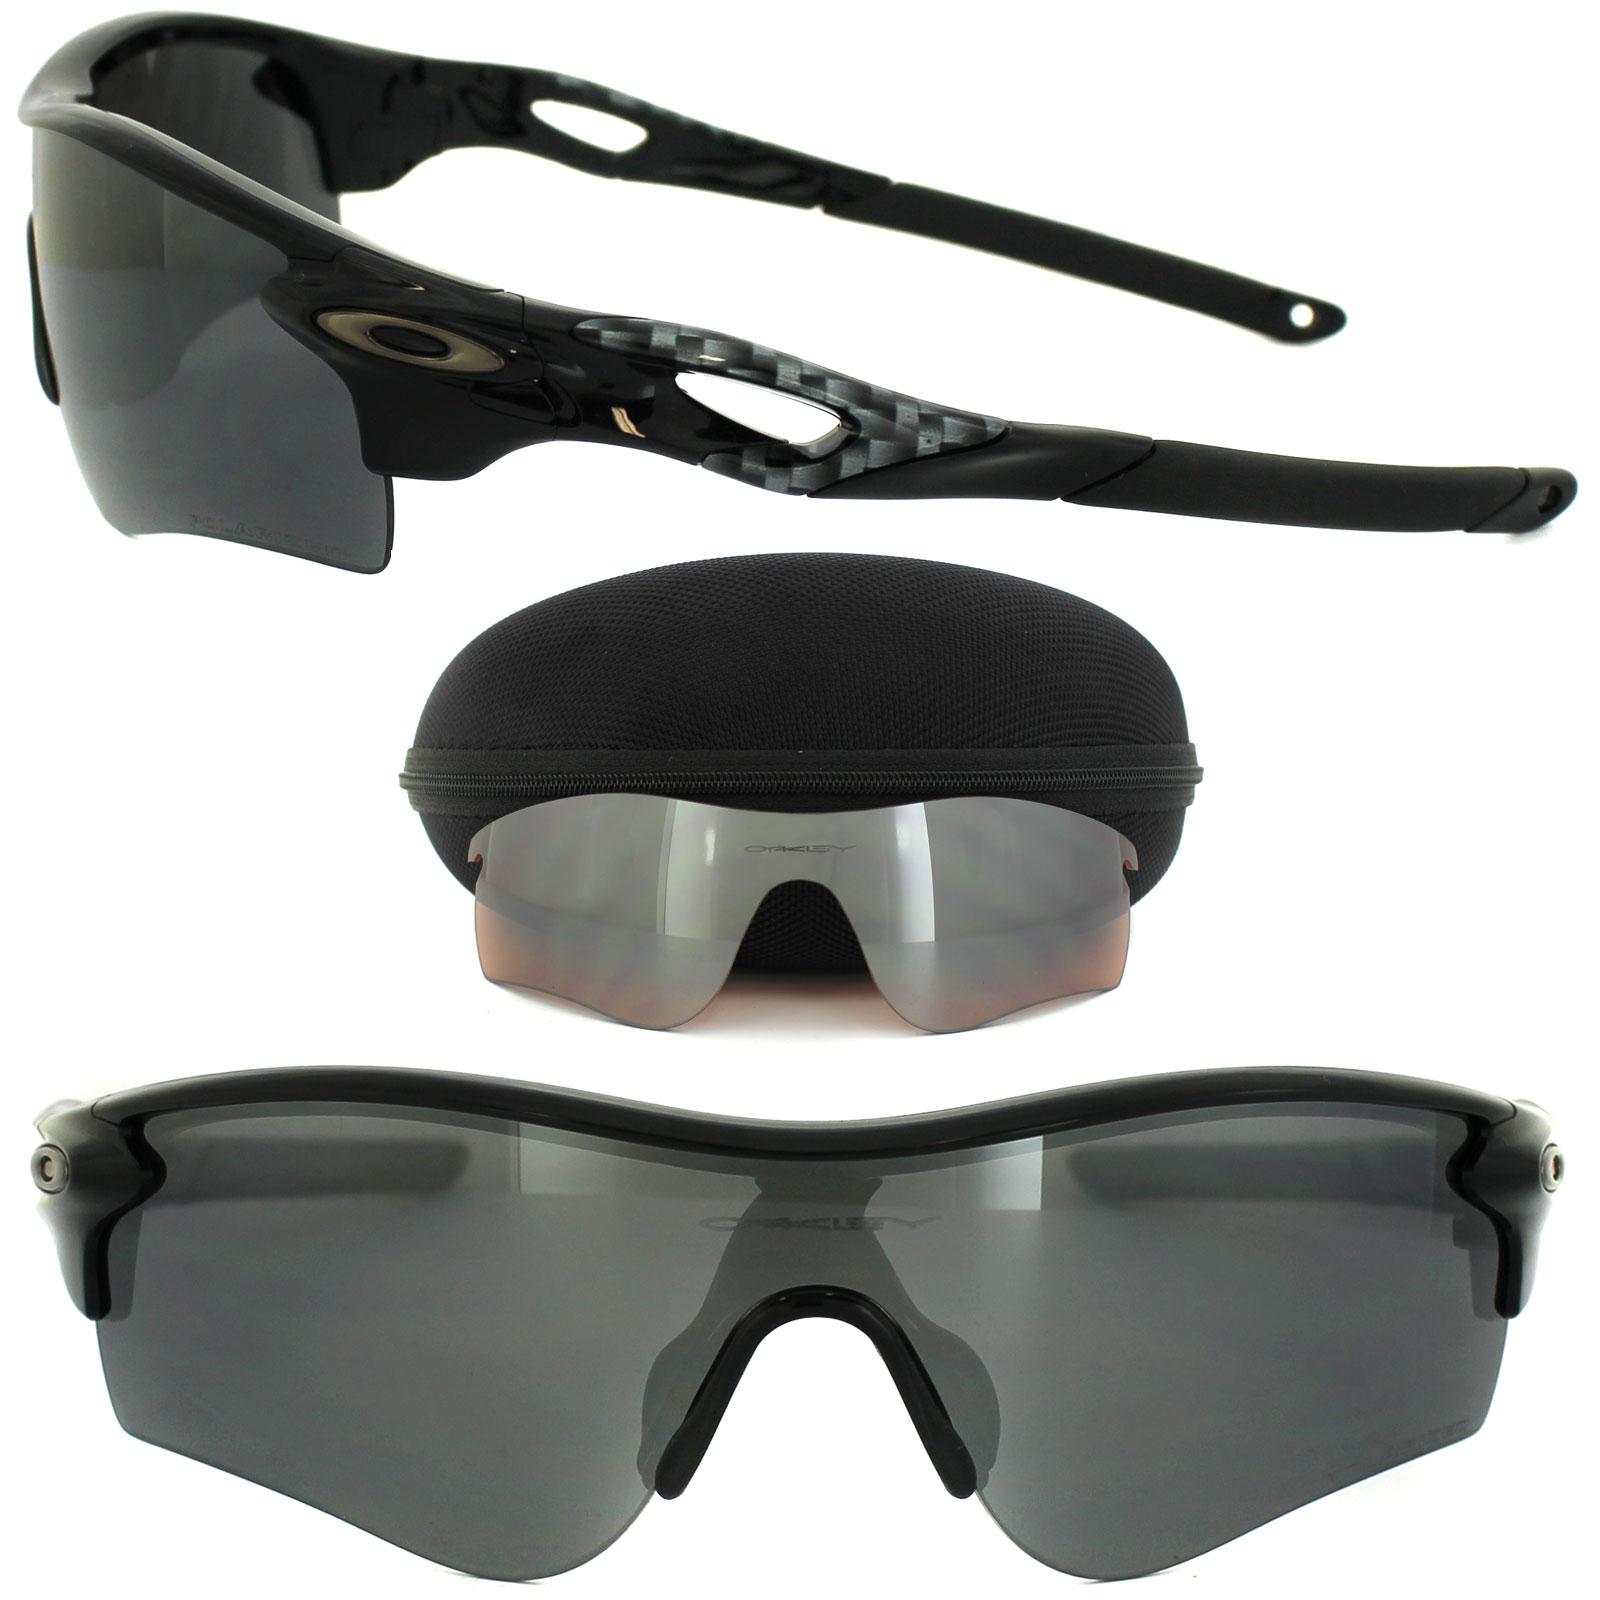 19f3bb3325 Sentinel Oakley Sunglasses Radarlock Path OO9181-12 Shiny Black Black  Iridium Polarized